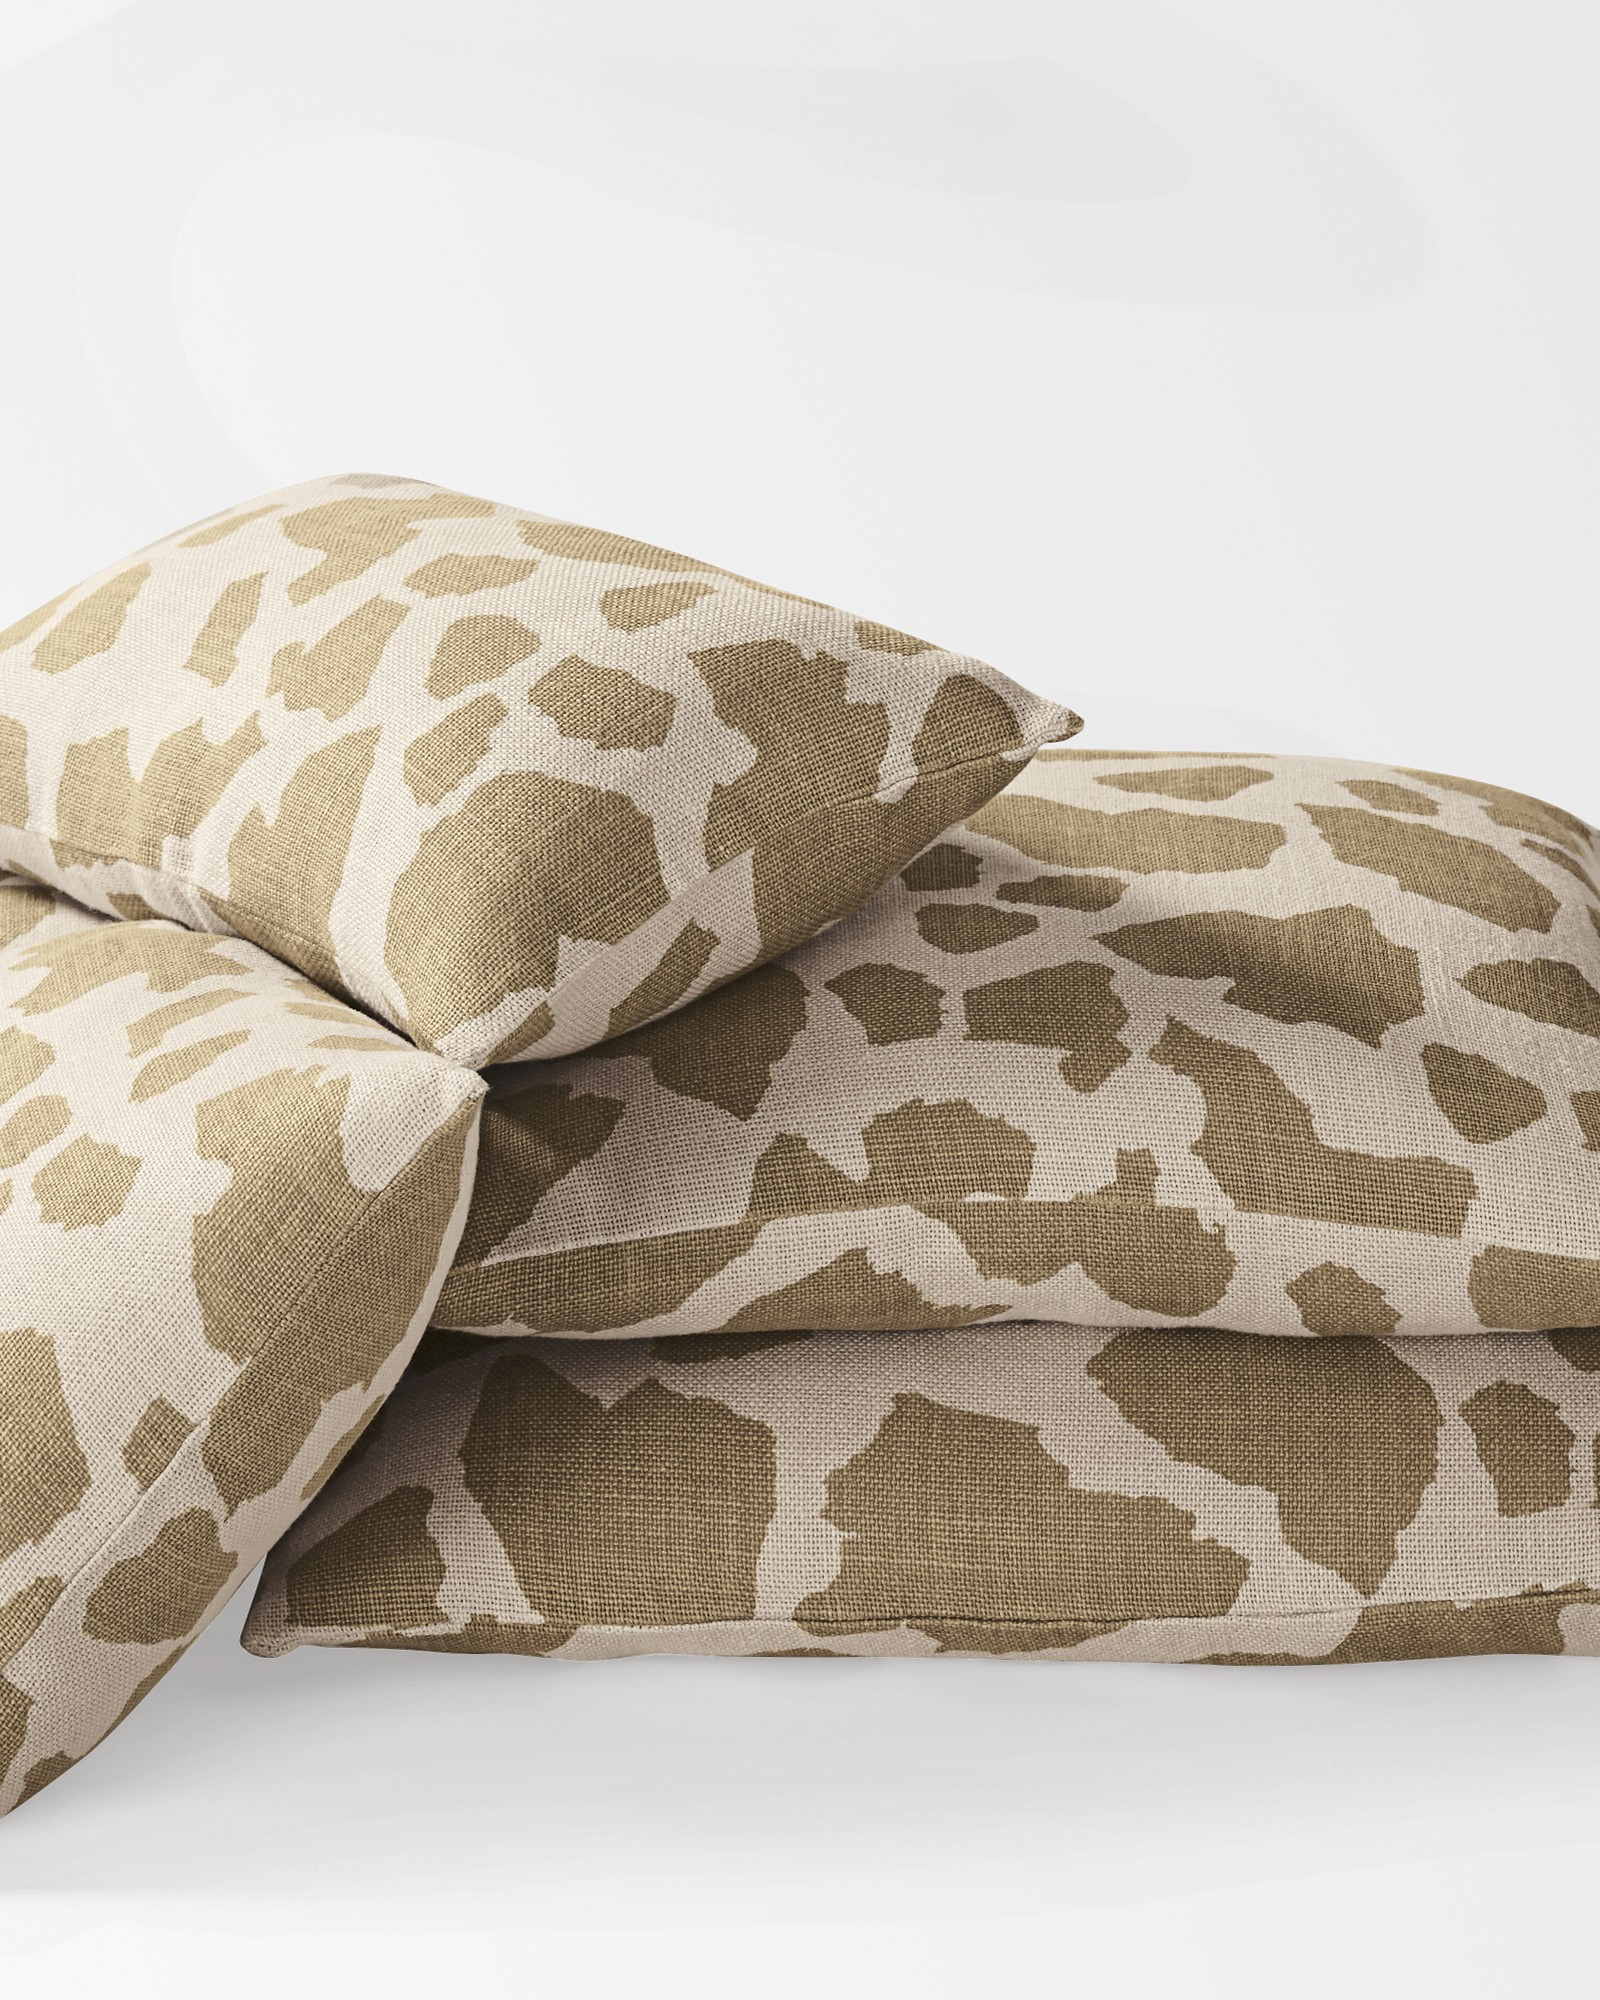 Apartminty Fresh Picks | Animal Theme | Giraffe Print Pillow Covers